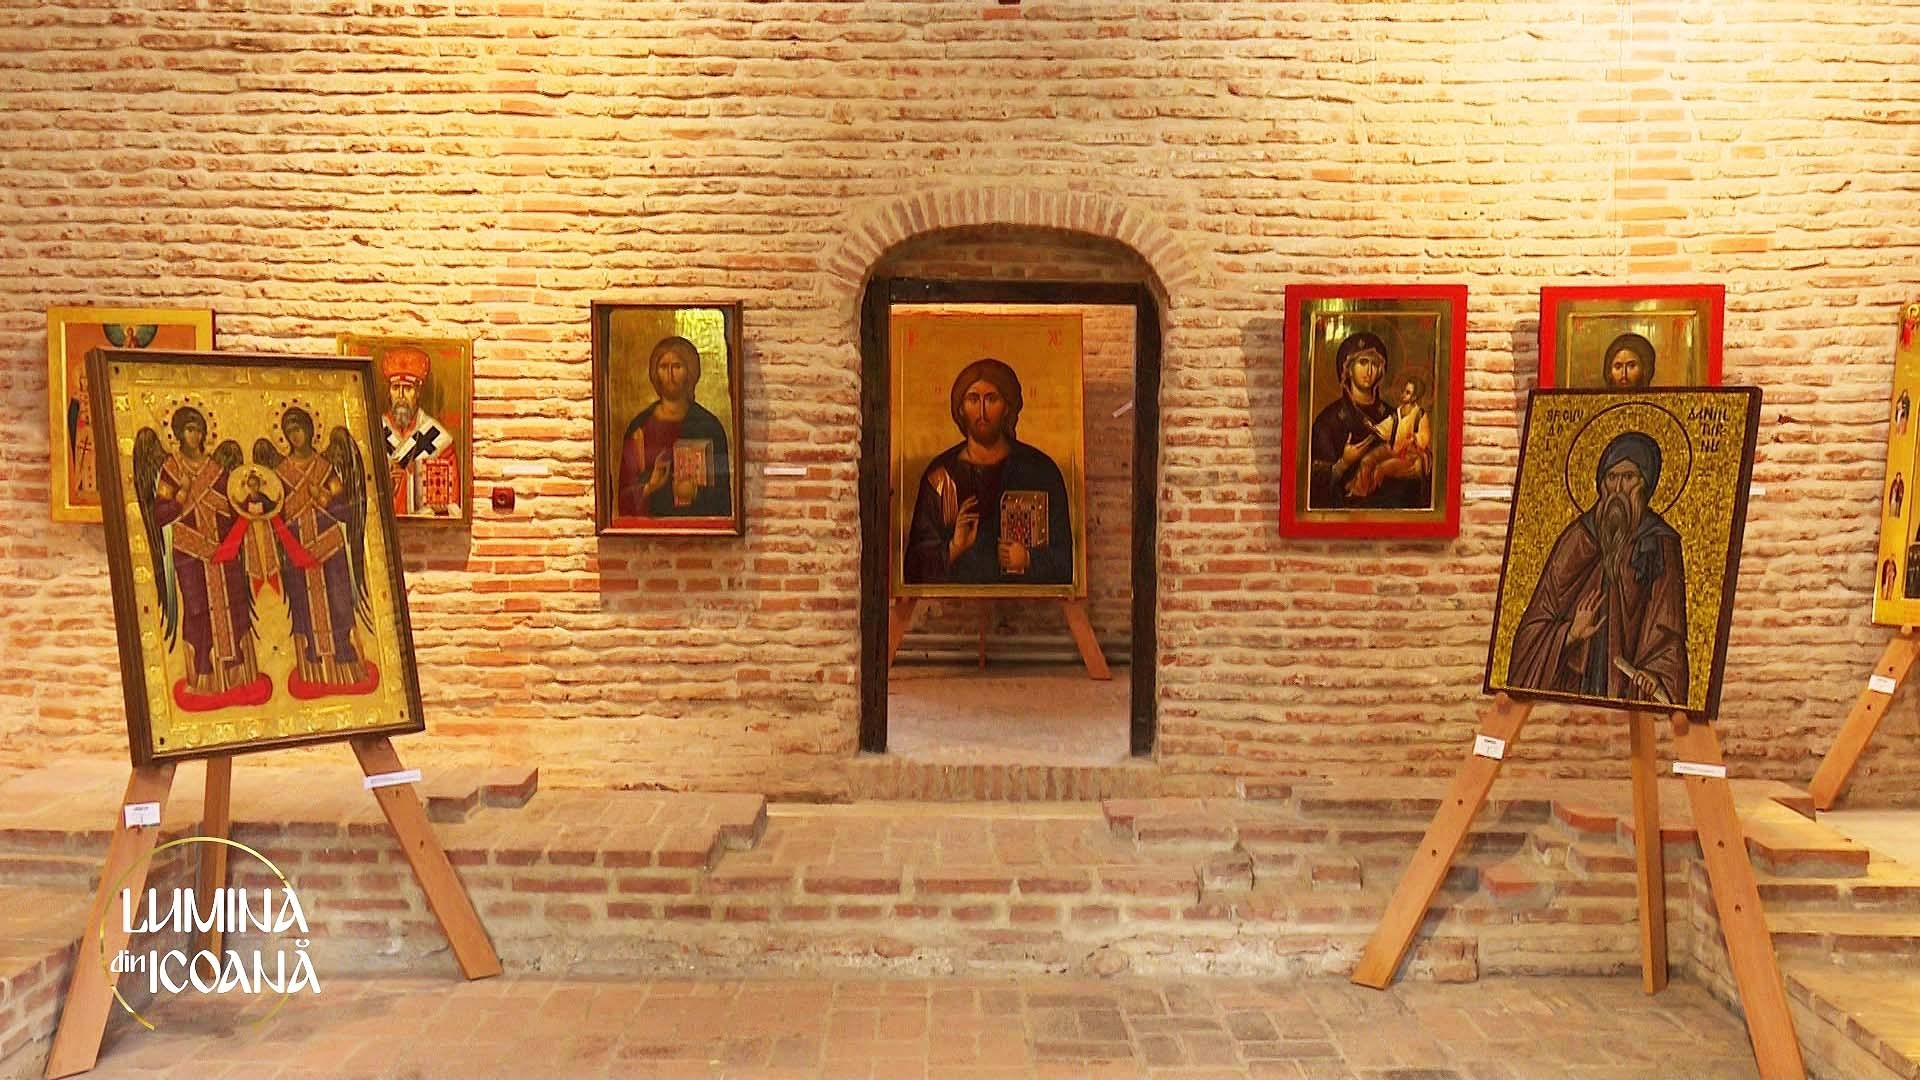 EXPOZITIA ANASTASIS. Ce inseamna icoana (bizantina) si cum trebuie sa fie iconarul? DE CE AVEM NEVOIE DE ICOANA? (reportaje video)